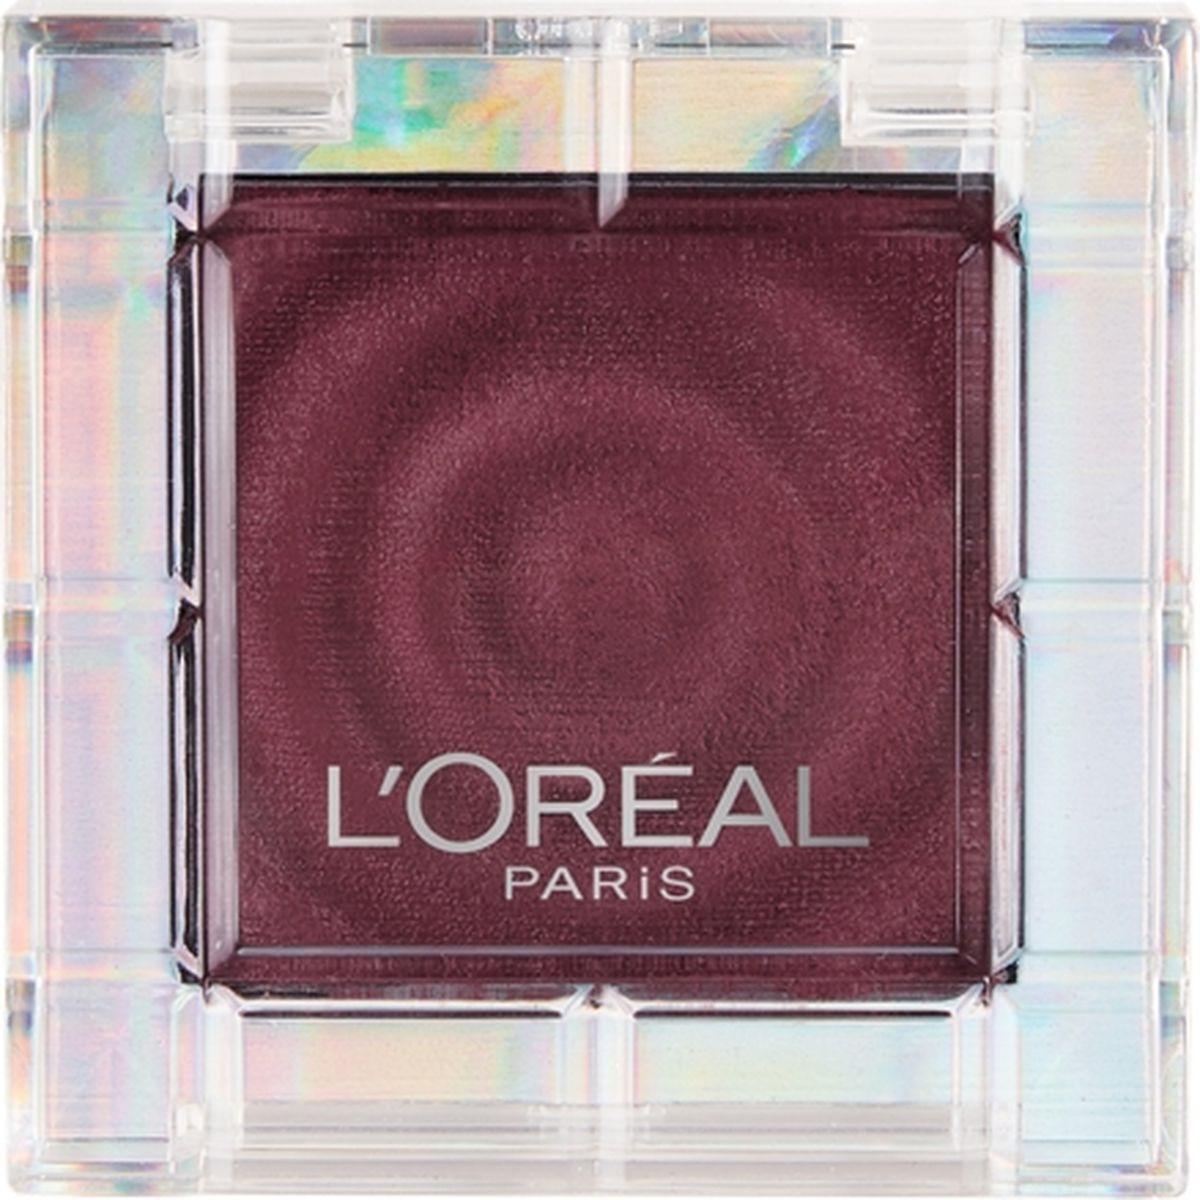 Тени для век L`Oreal Paris Color Queen, на масляной основе, тон 09, Интригующий, 4 г